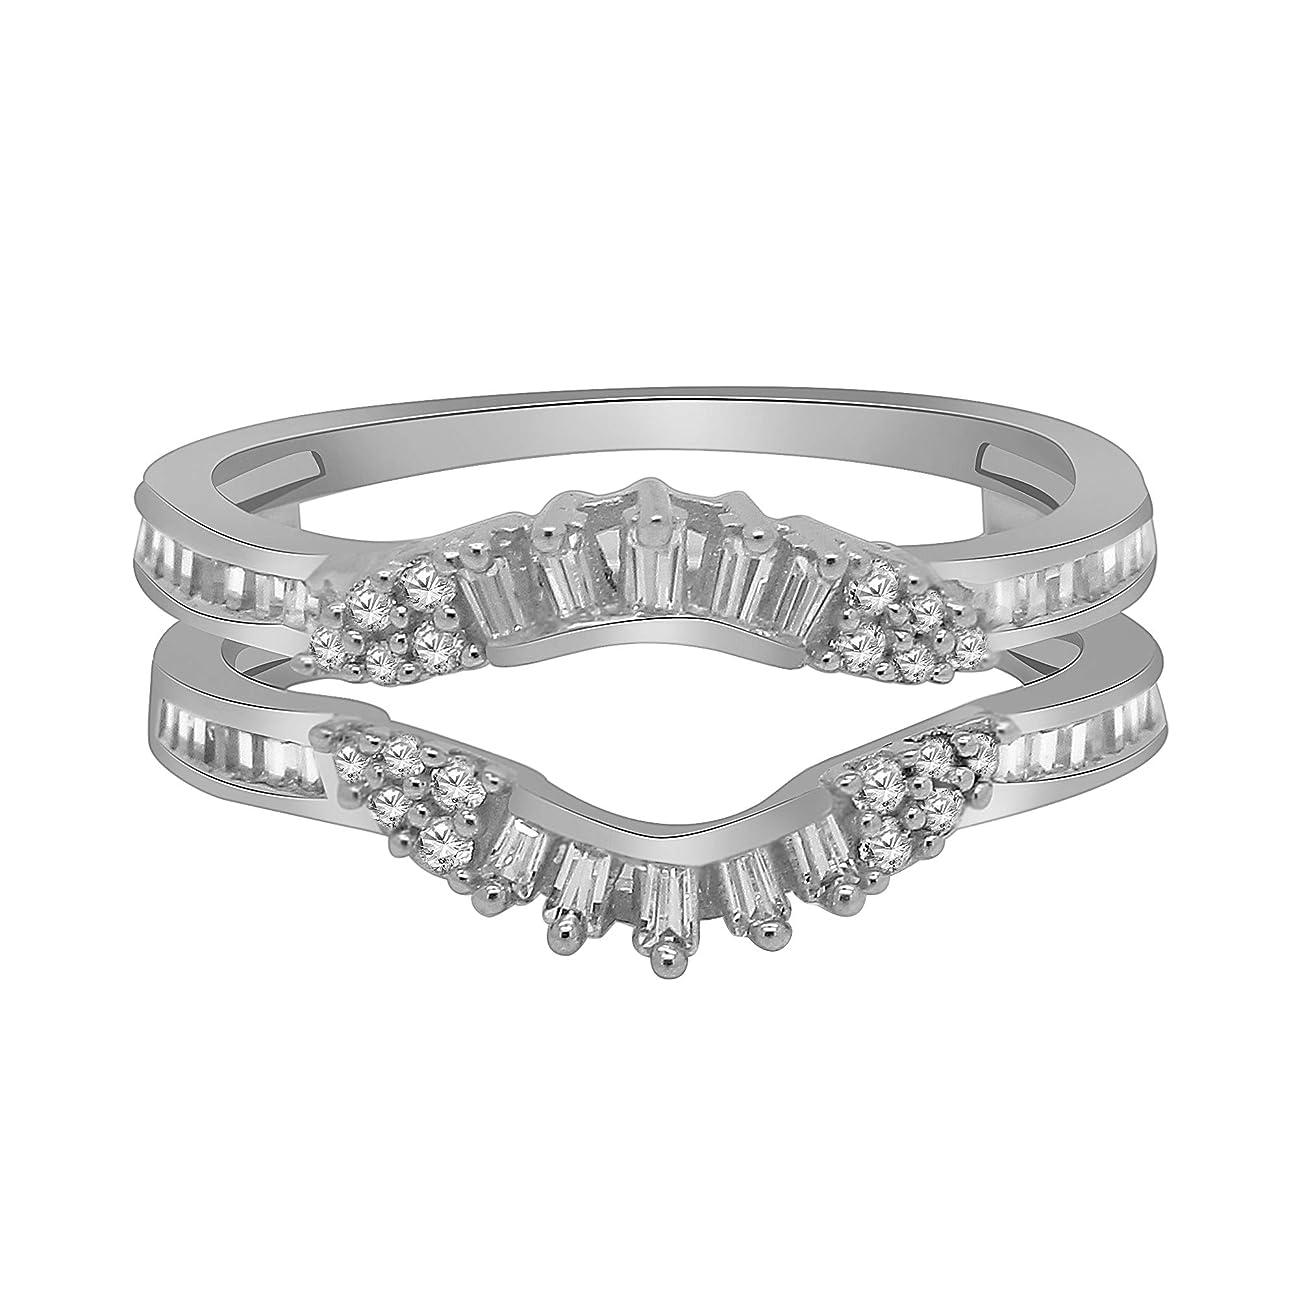 OMEGA JEWELLERY 0.34 Ct Round & Baguette Shape Natural Diamond 14K White Gold Enhancer Wrap Guard Ring Sz-7